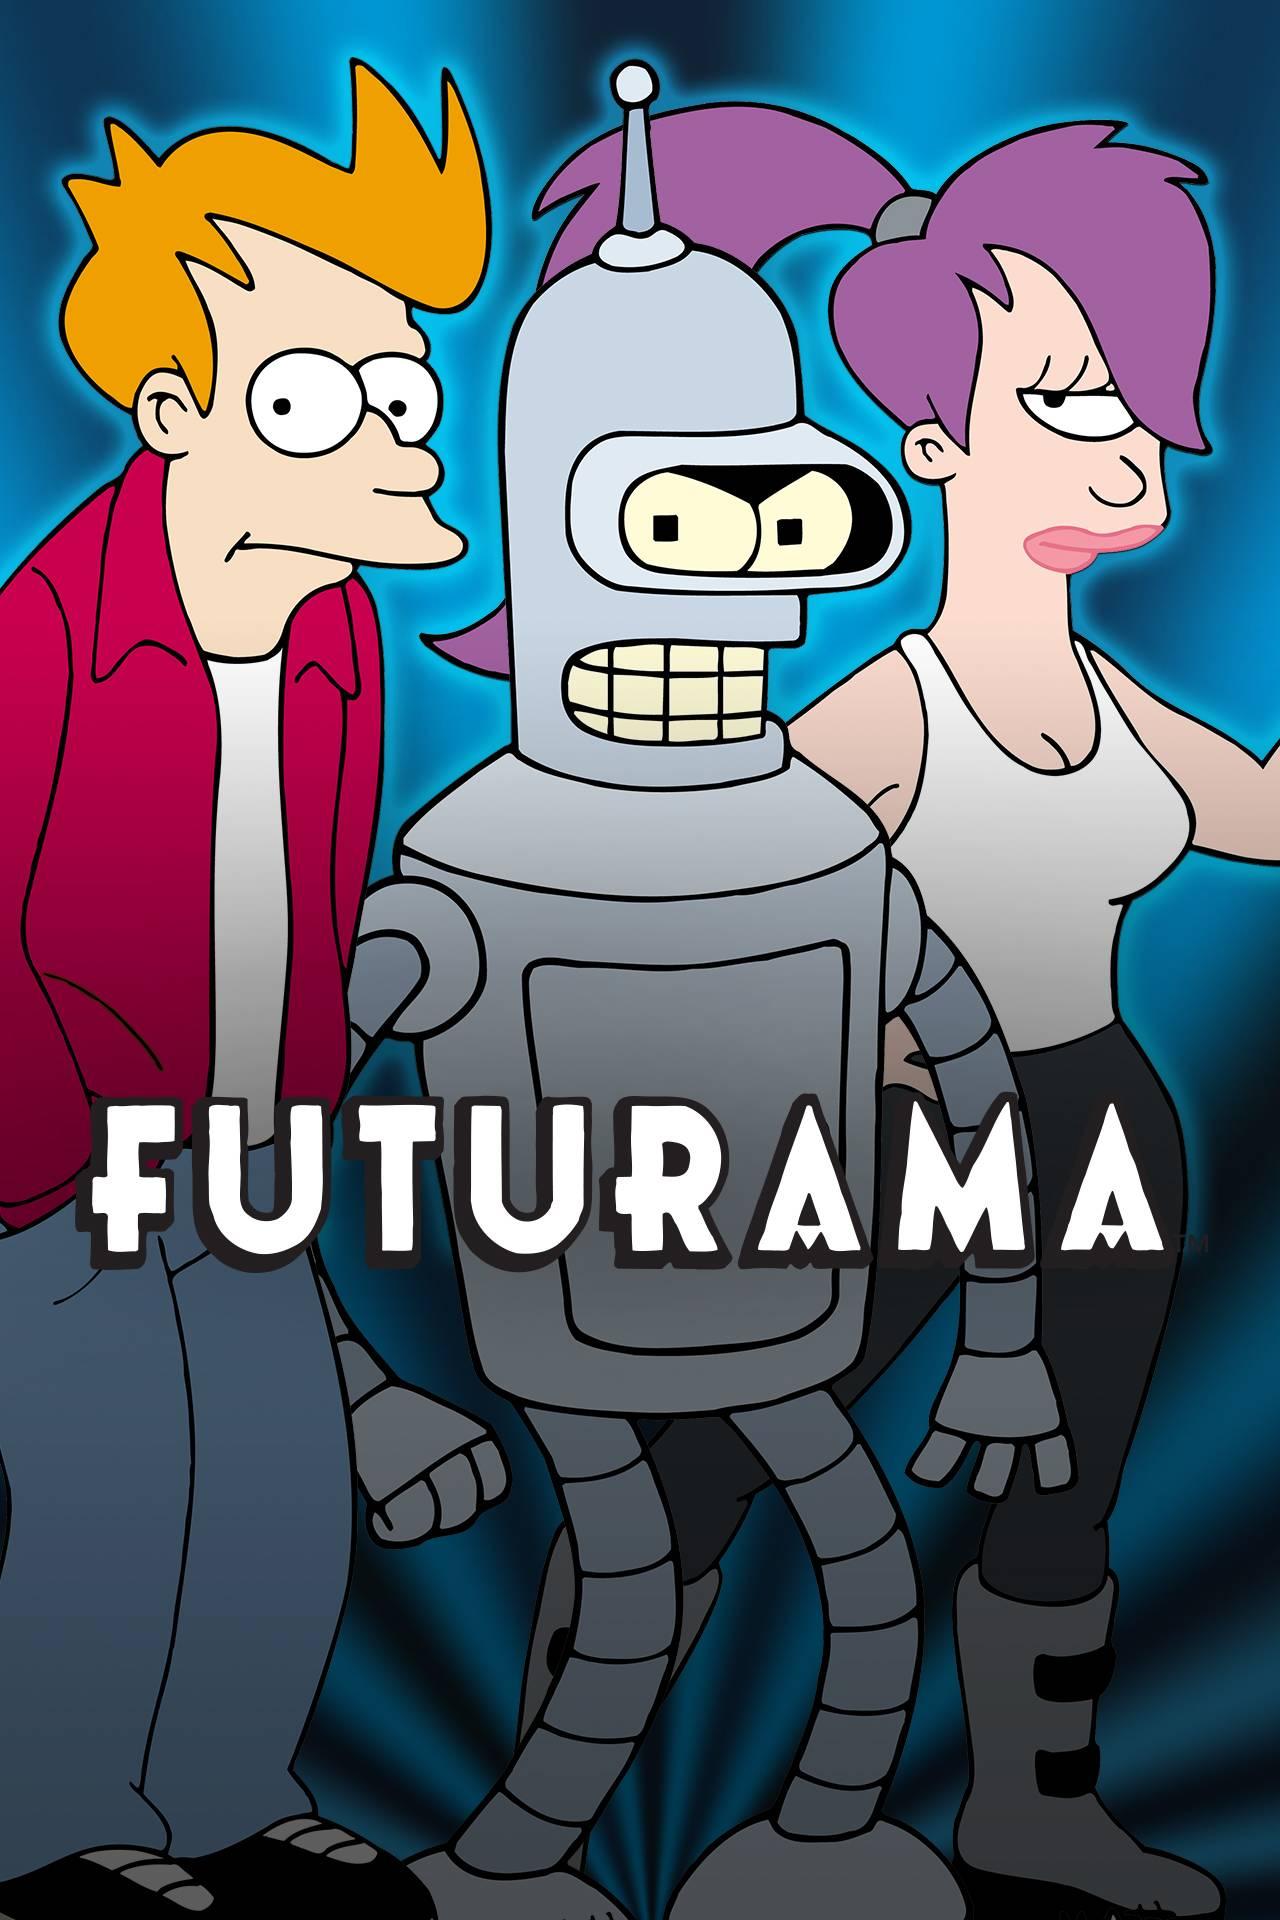 Futurama - Season 7 - TV Series | Comedy Central US